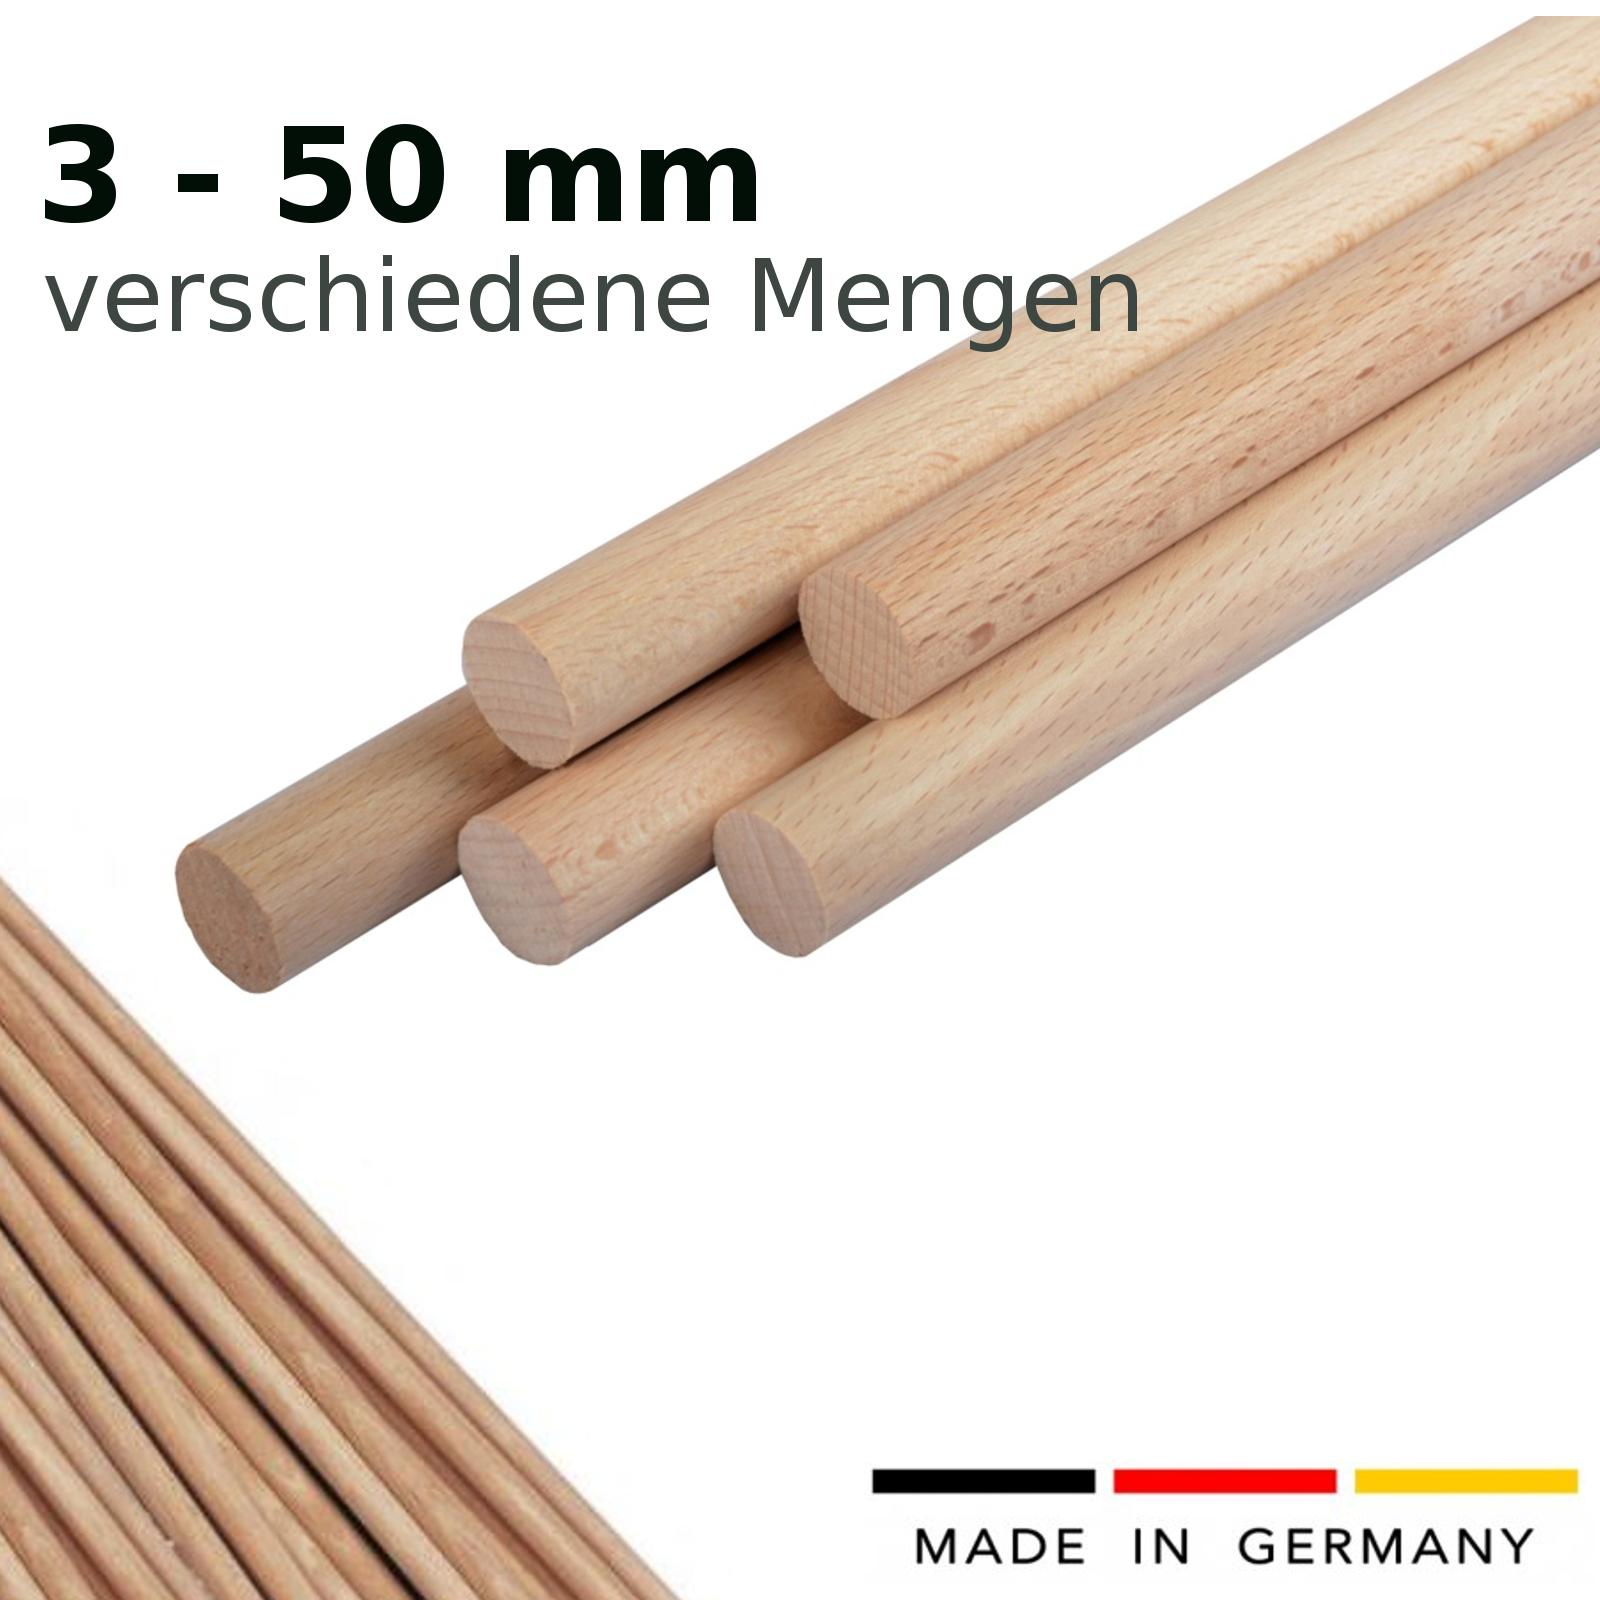 100 er Set - 100 Stück -Rundstäbe - Länge 50 cm - Rundstab Buche glatt - Buchestab (100 Stck)